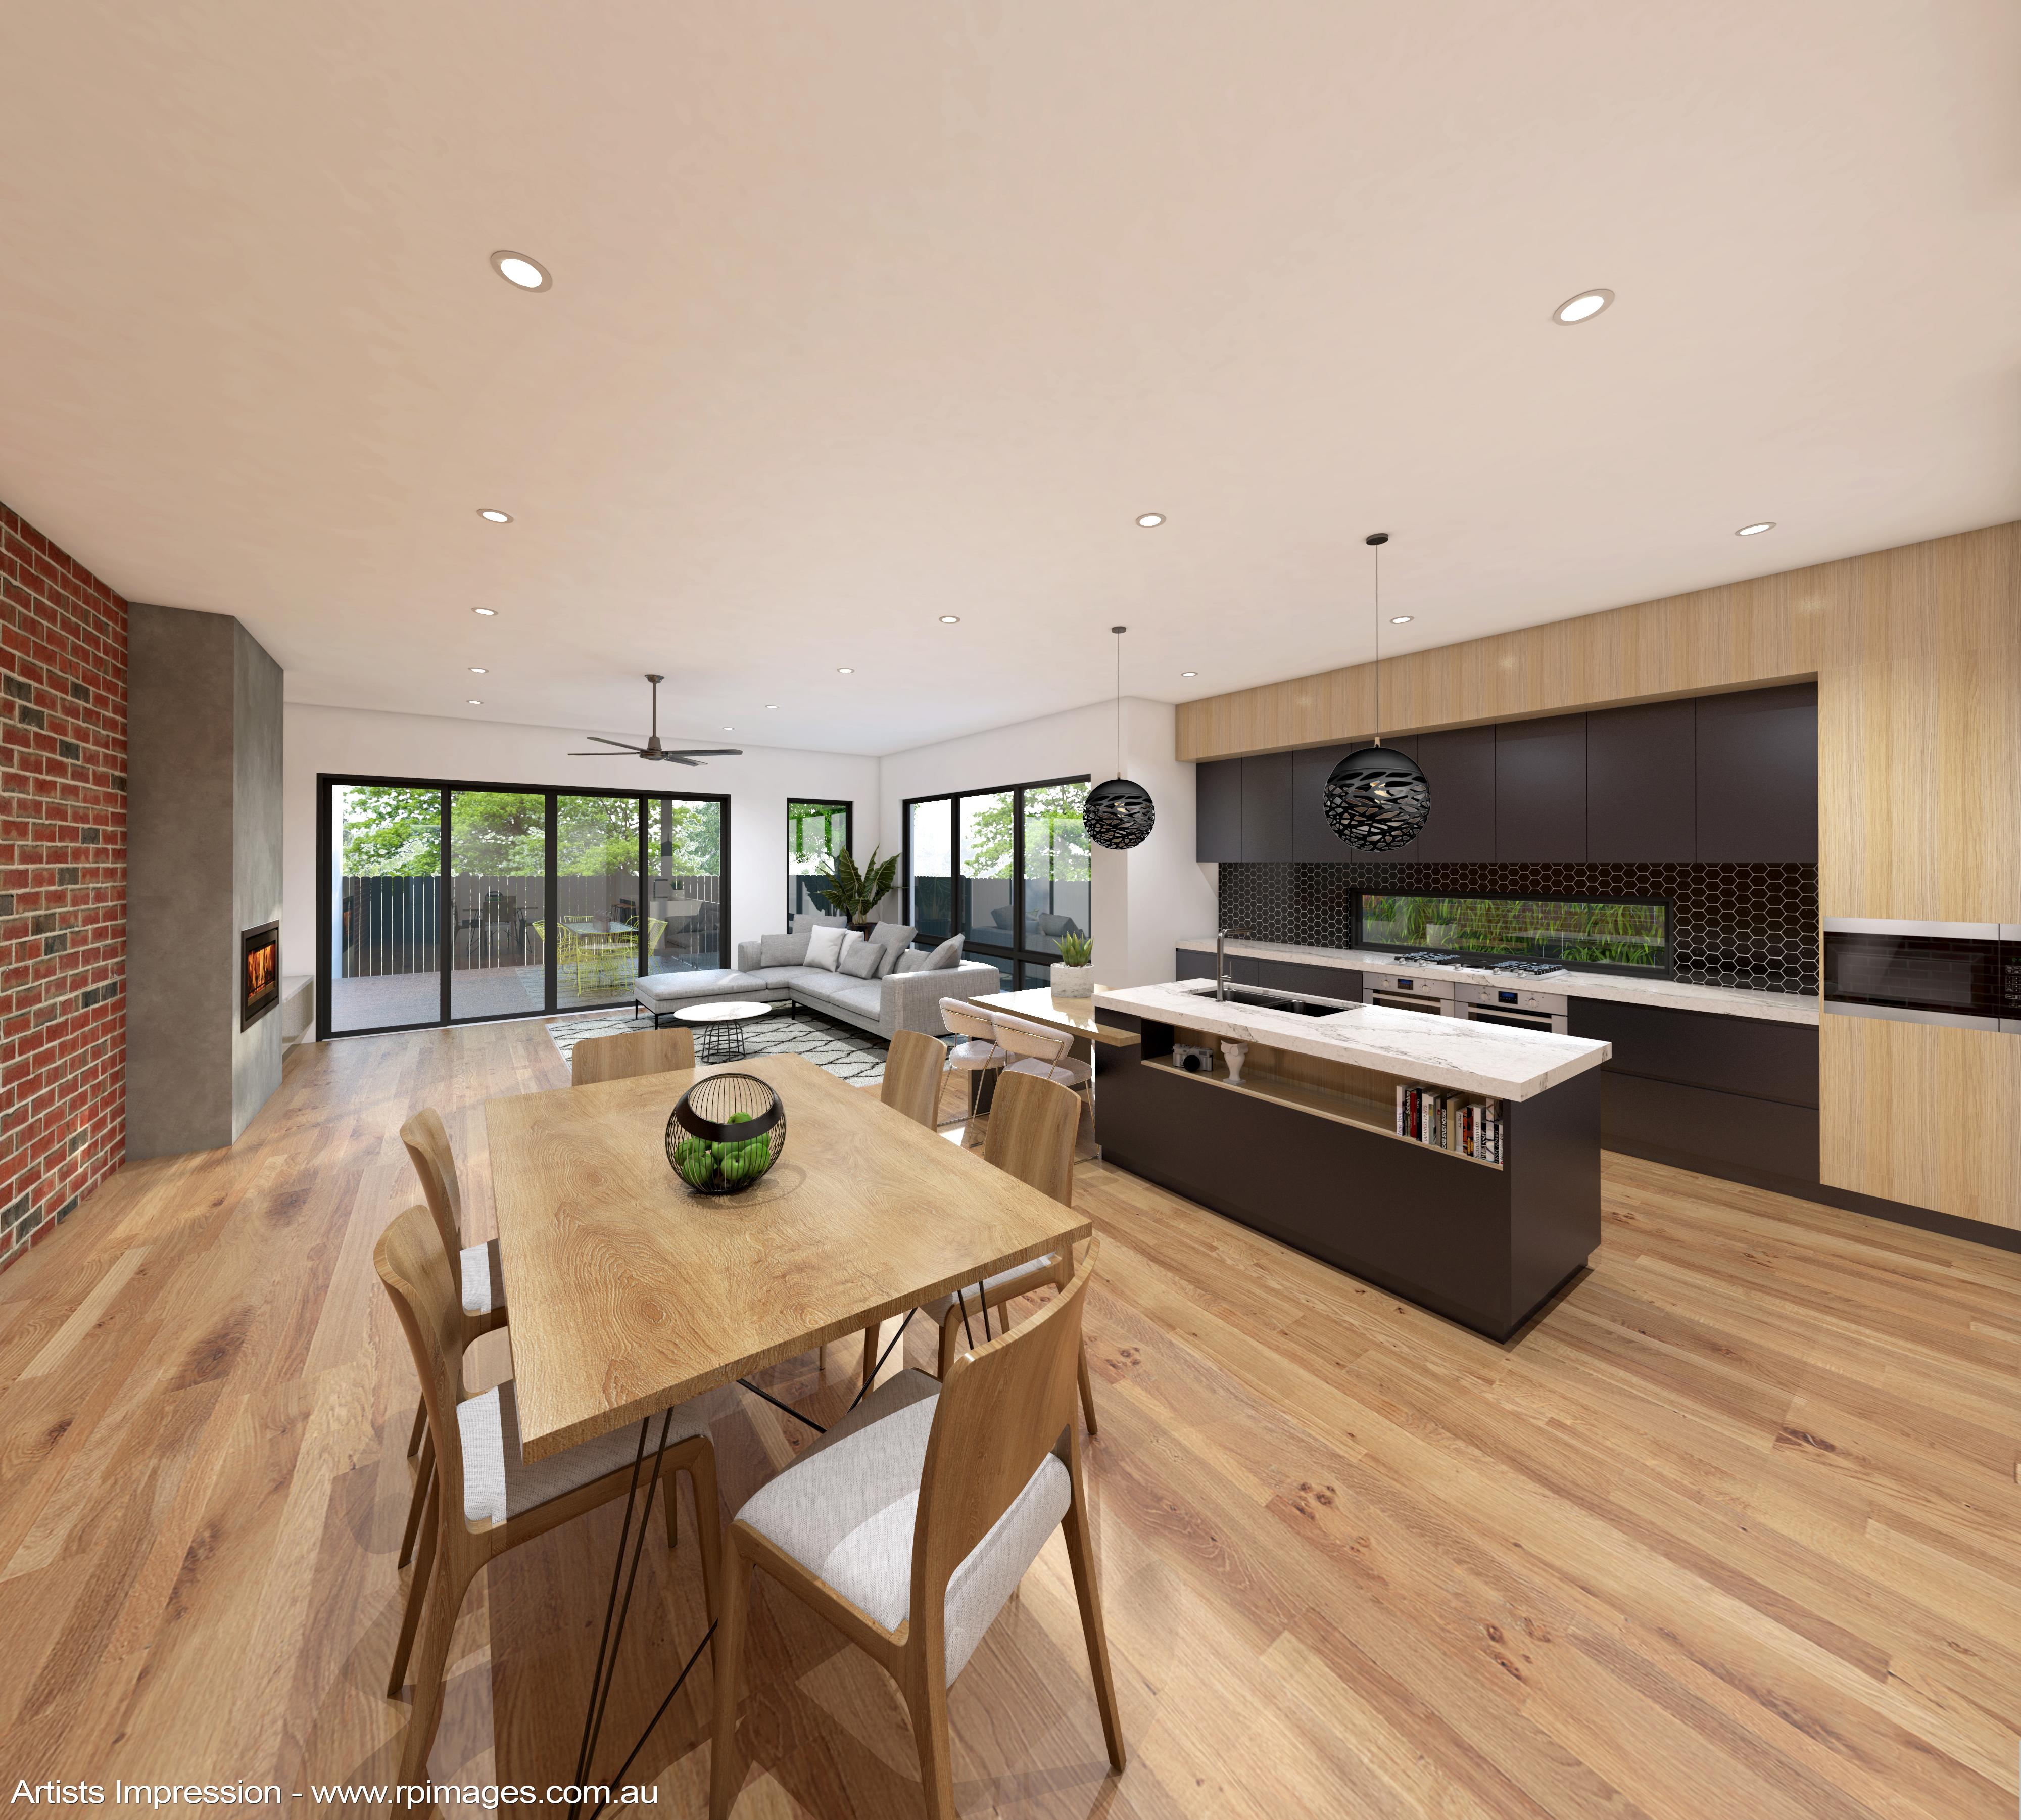 1-9 Portrush Grove Mornington Interior -